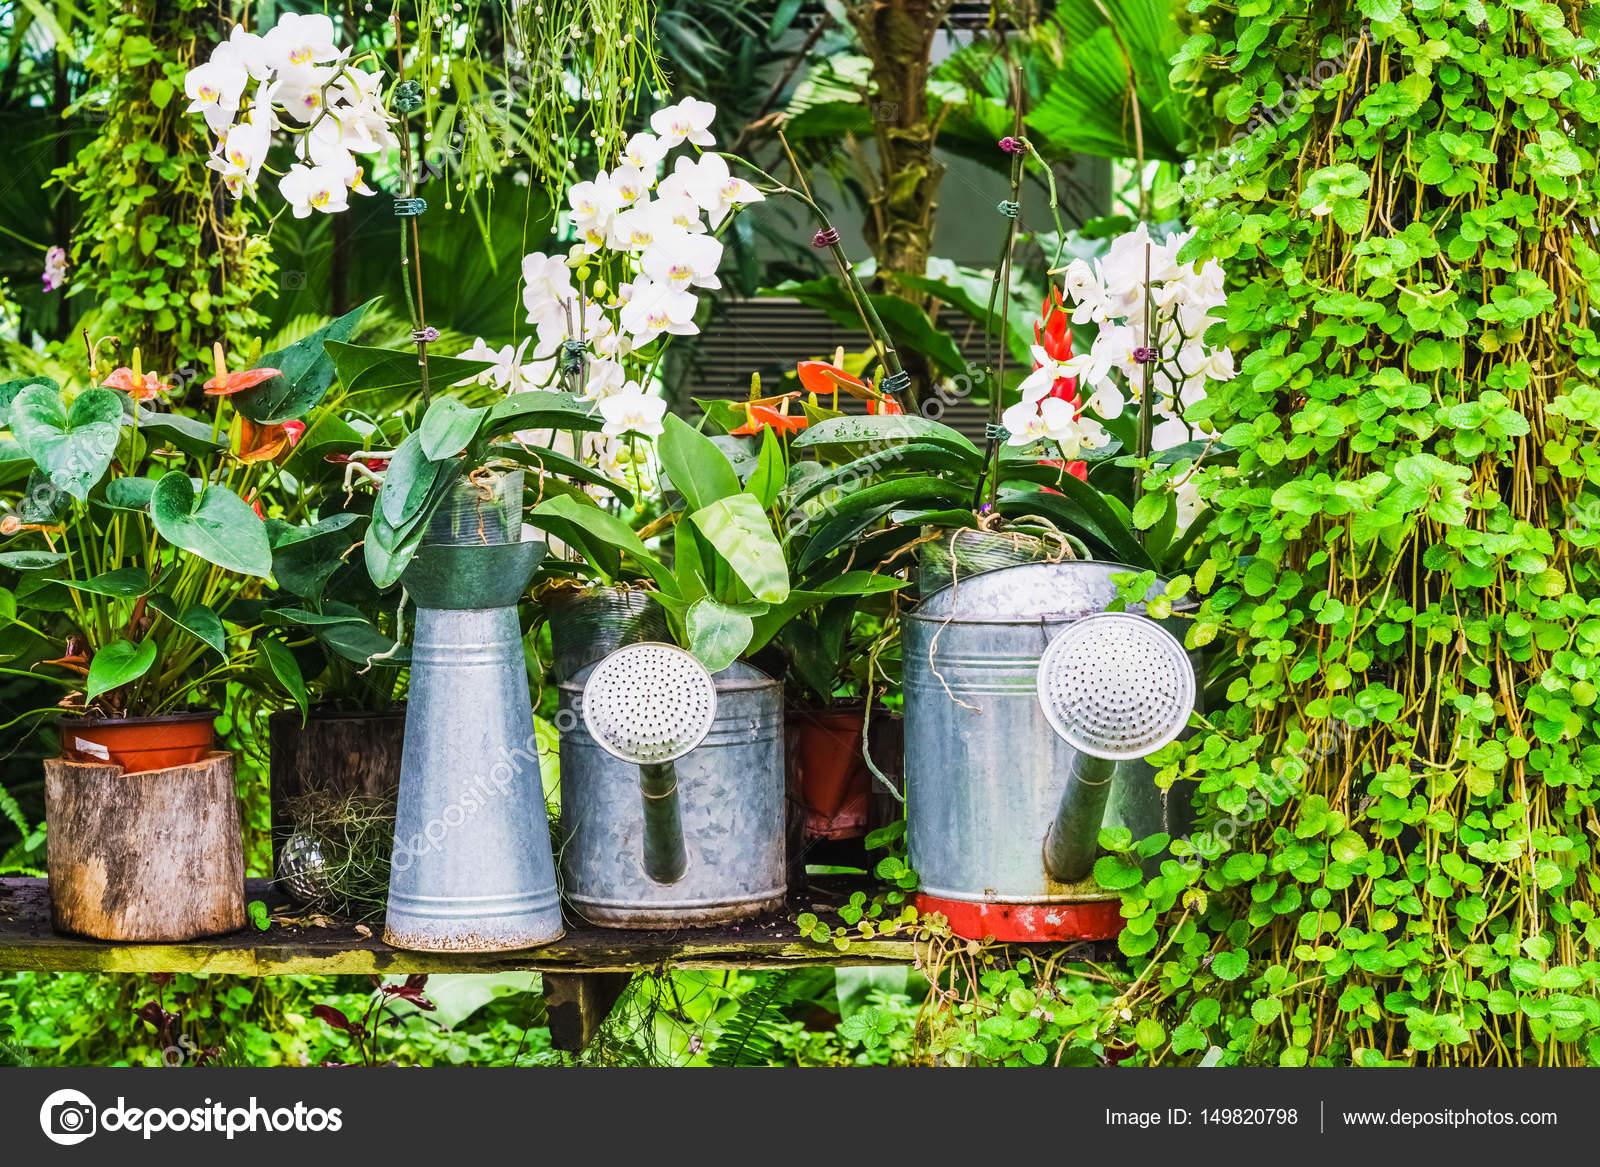 depositphotos stock photo garden decoration idea using the